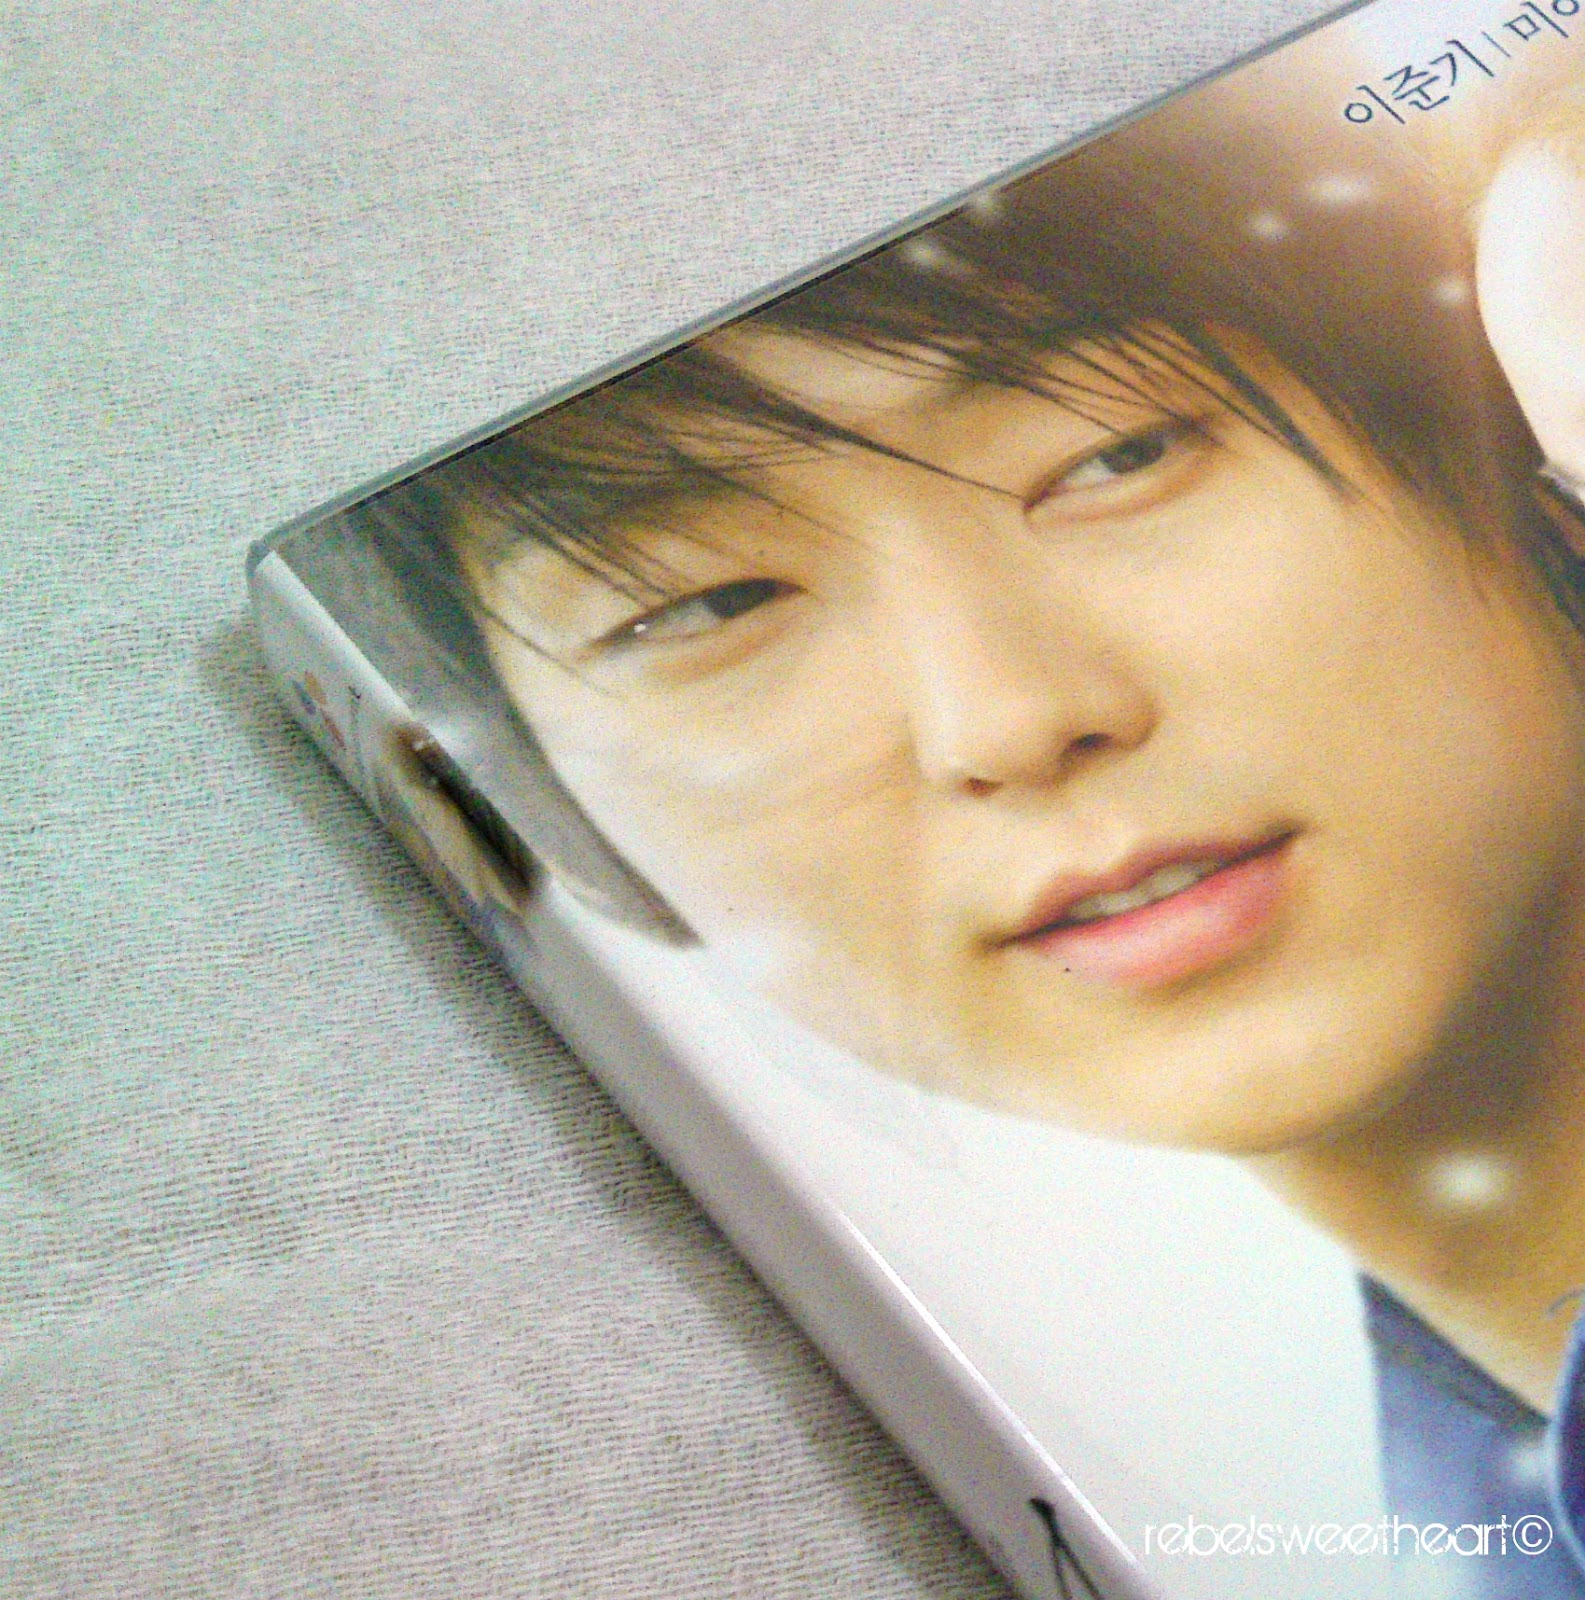 Oh, Min! :)